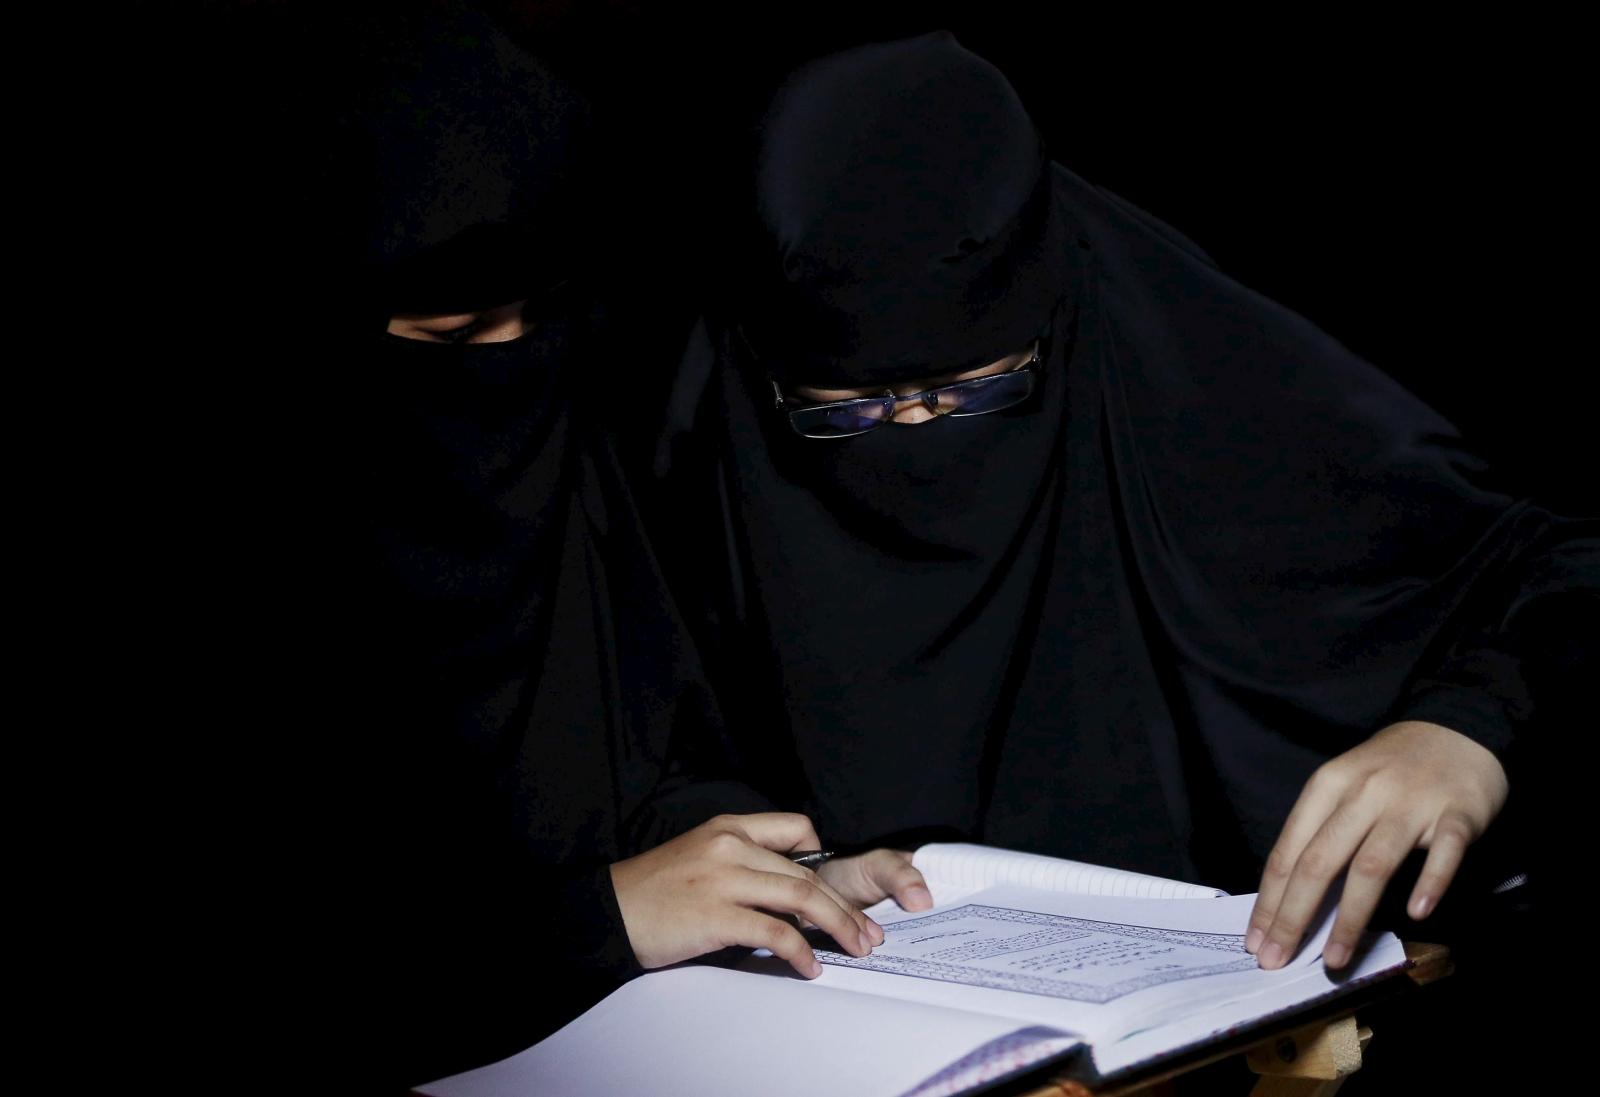 Malaysian students studying the Koran